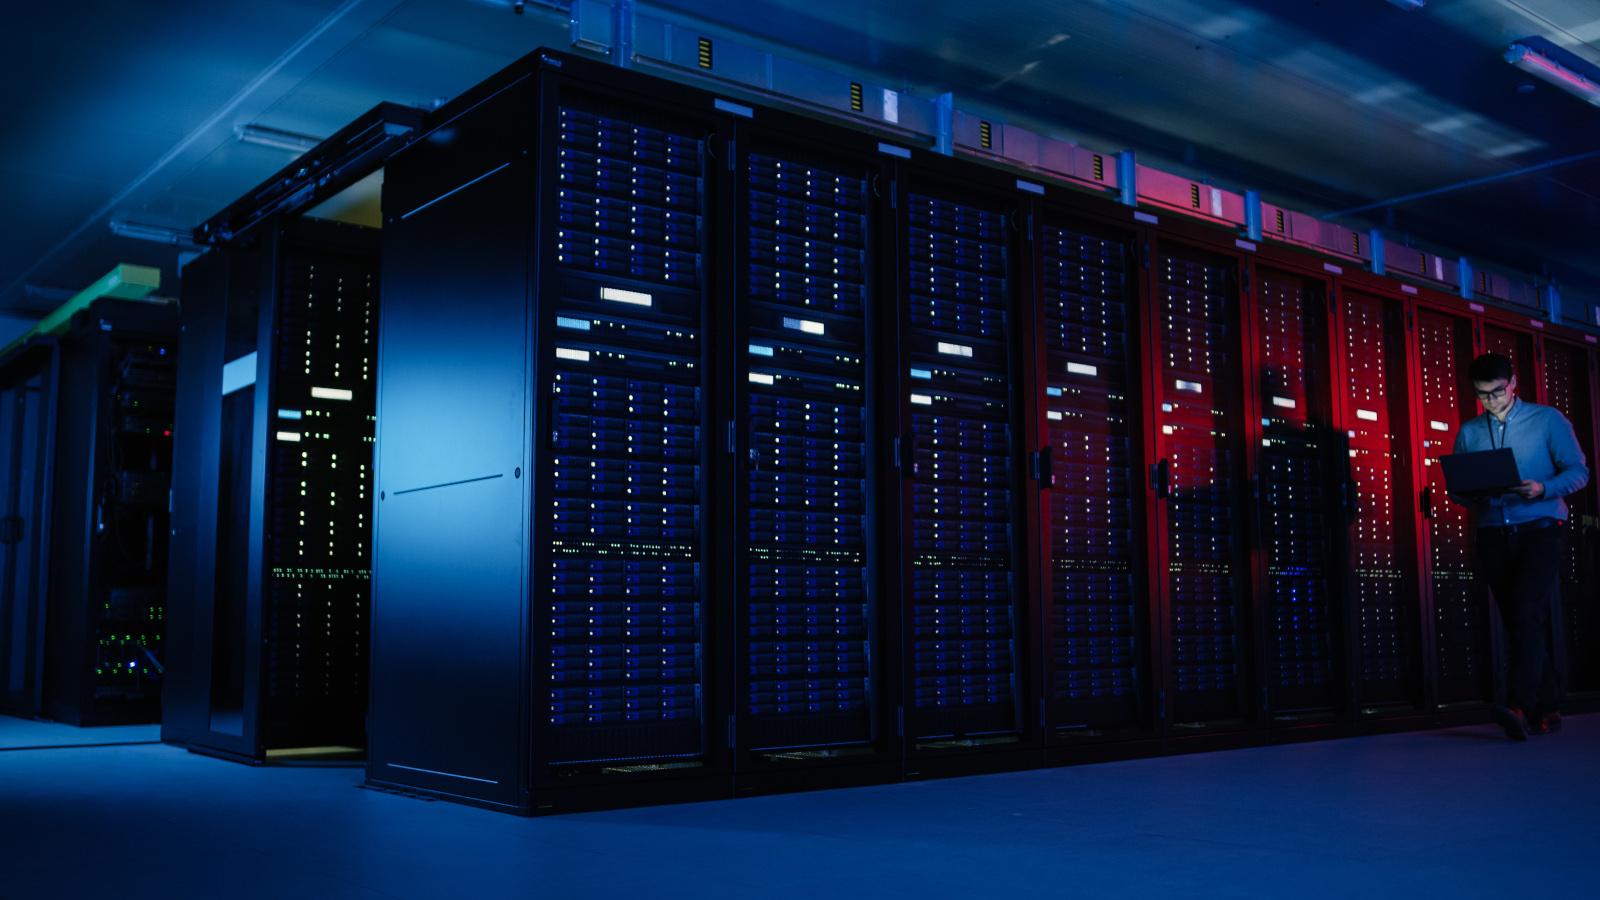 NVMe-oF: эволюция архитектуры хранения в центрах обработки данных